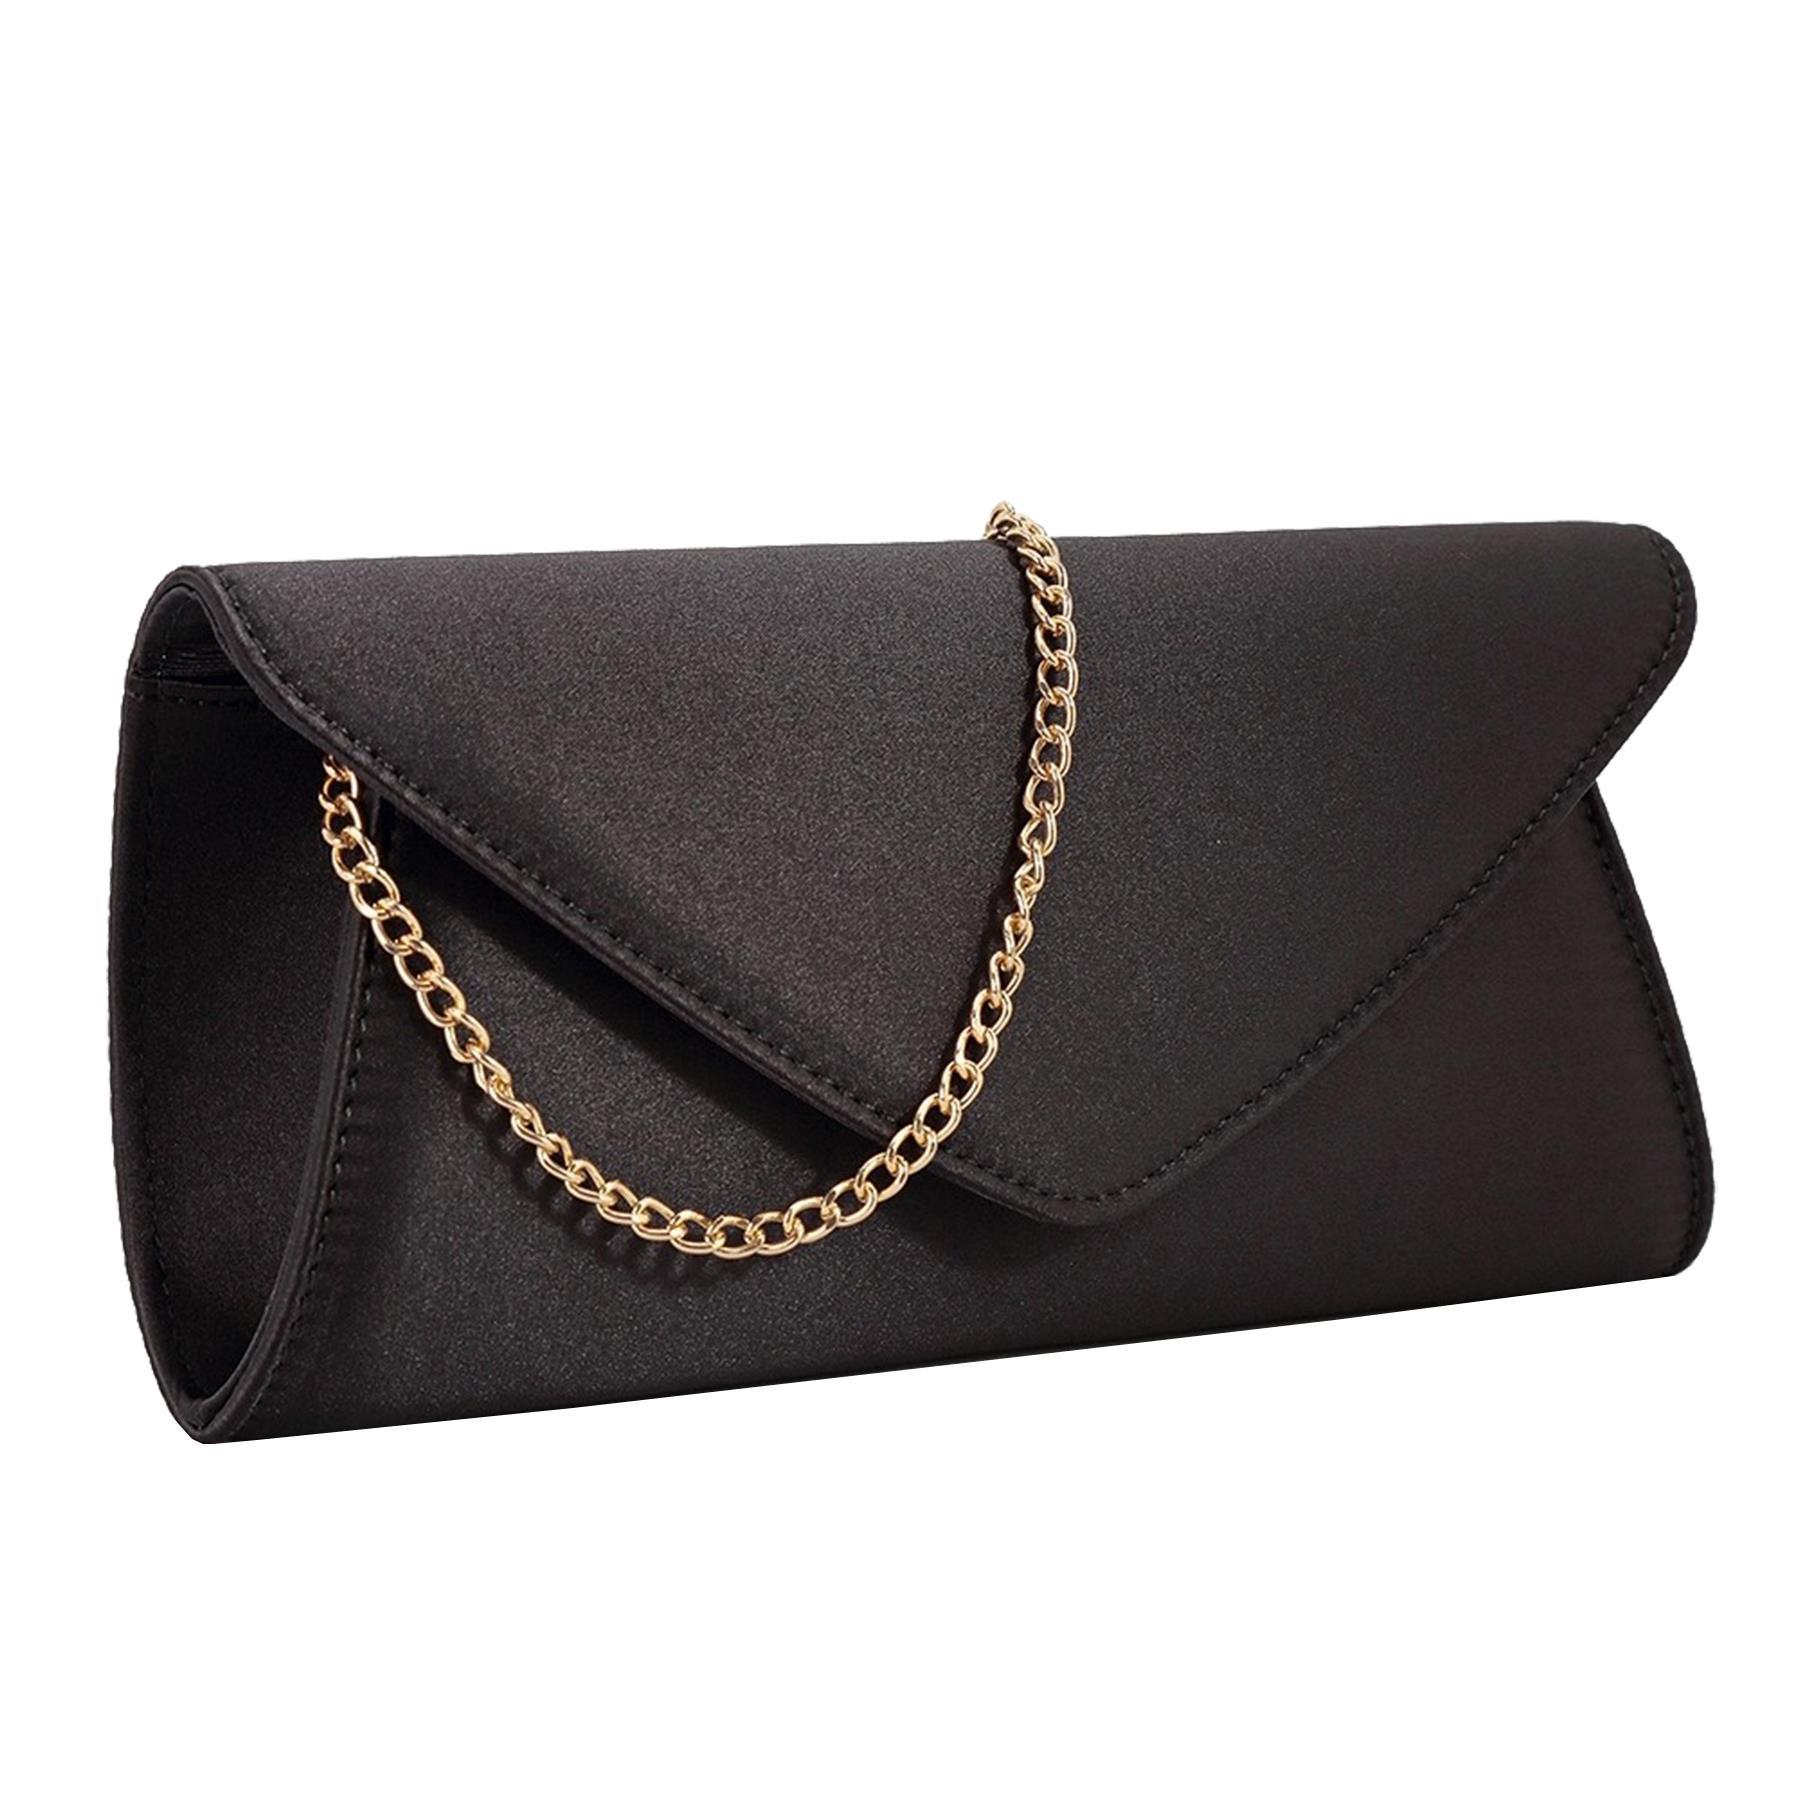 New-Ladies-Stylish-3D-Envelope-Satin-Prom-Party-Clutch-Bag-Purse thumbnail 3